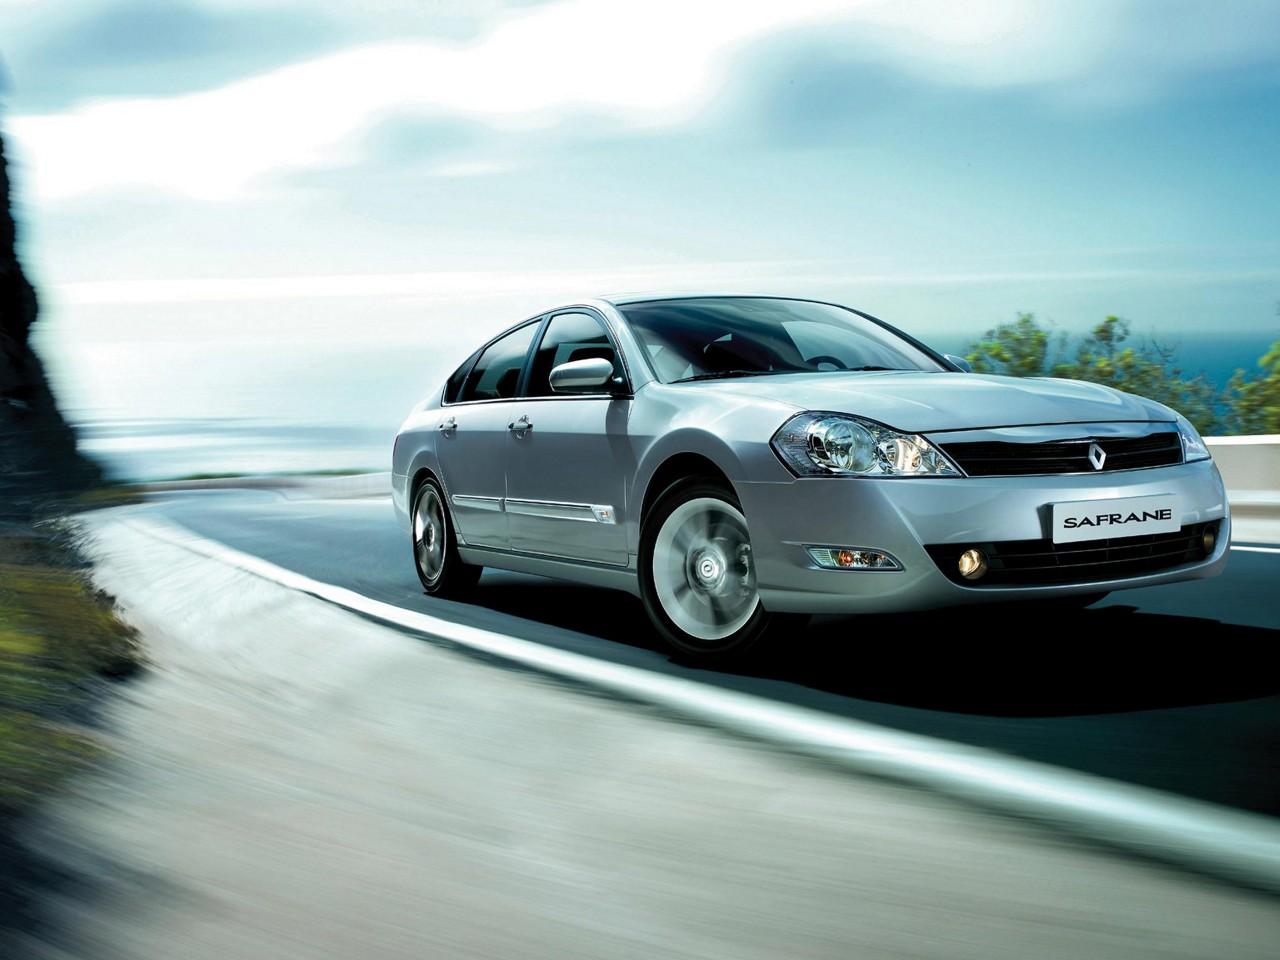 2009 Renault Safrane Motor Desktop